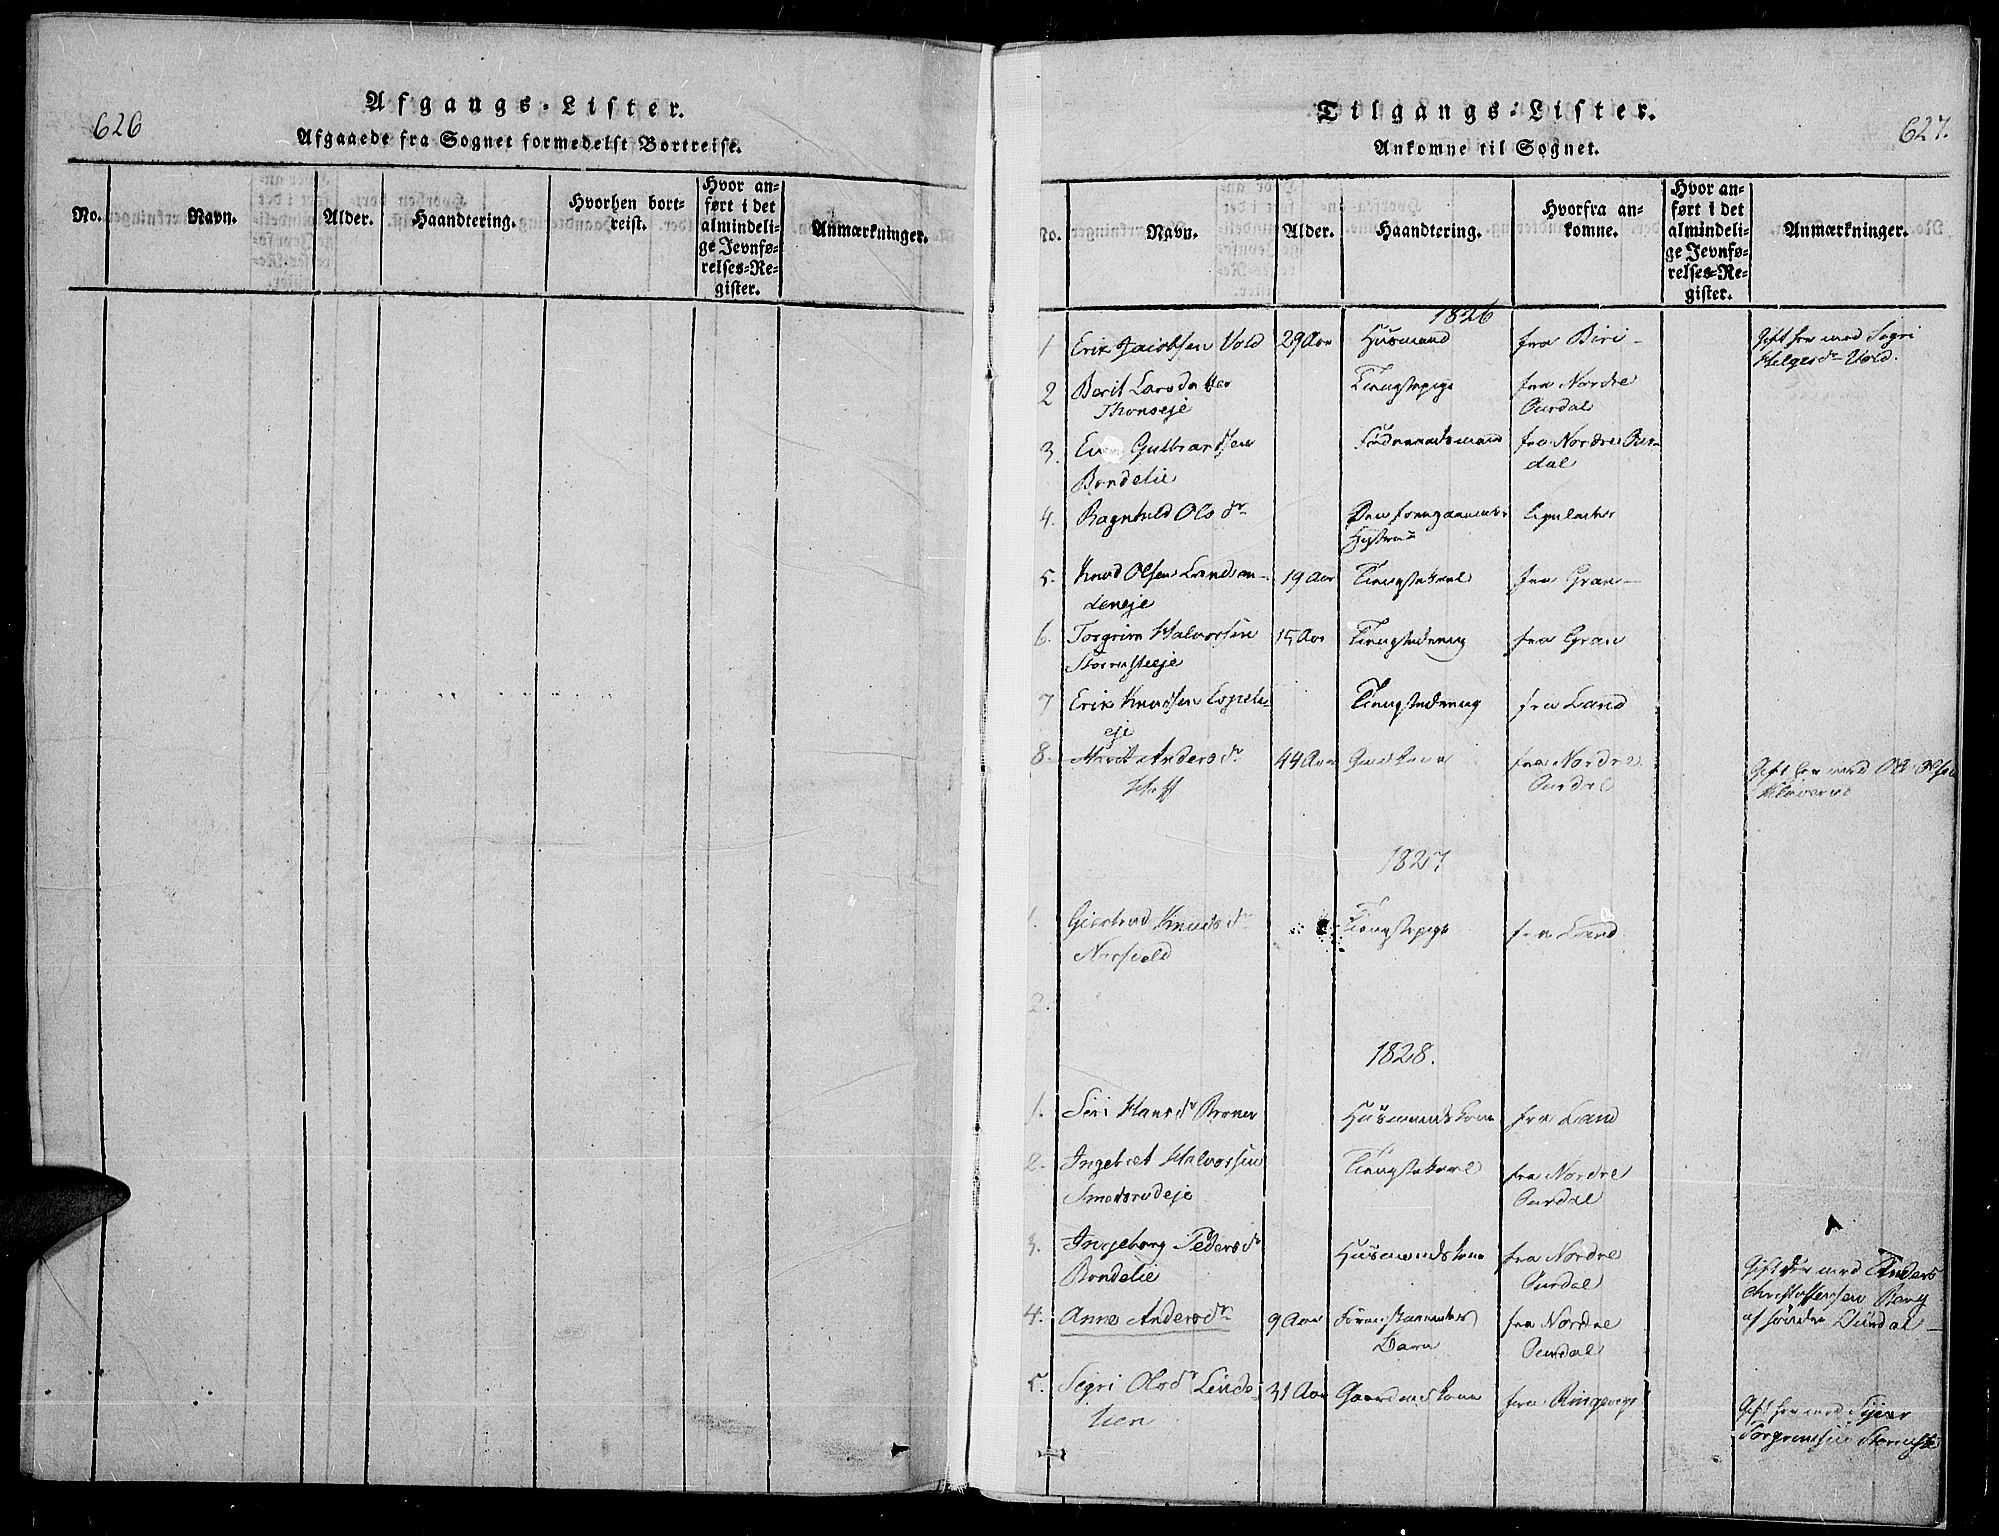 SAH, Sør-Aurdal prestekontor, Parish register (official) no. 3, 1825-1840, p. 626-627